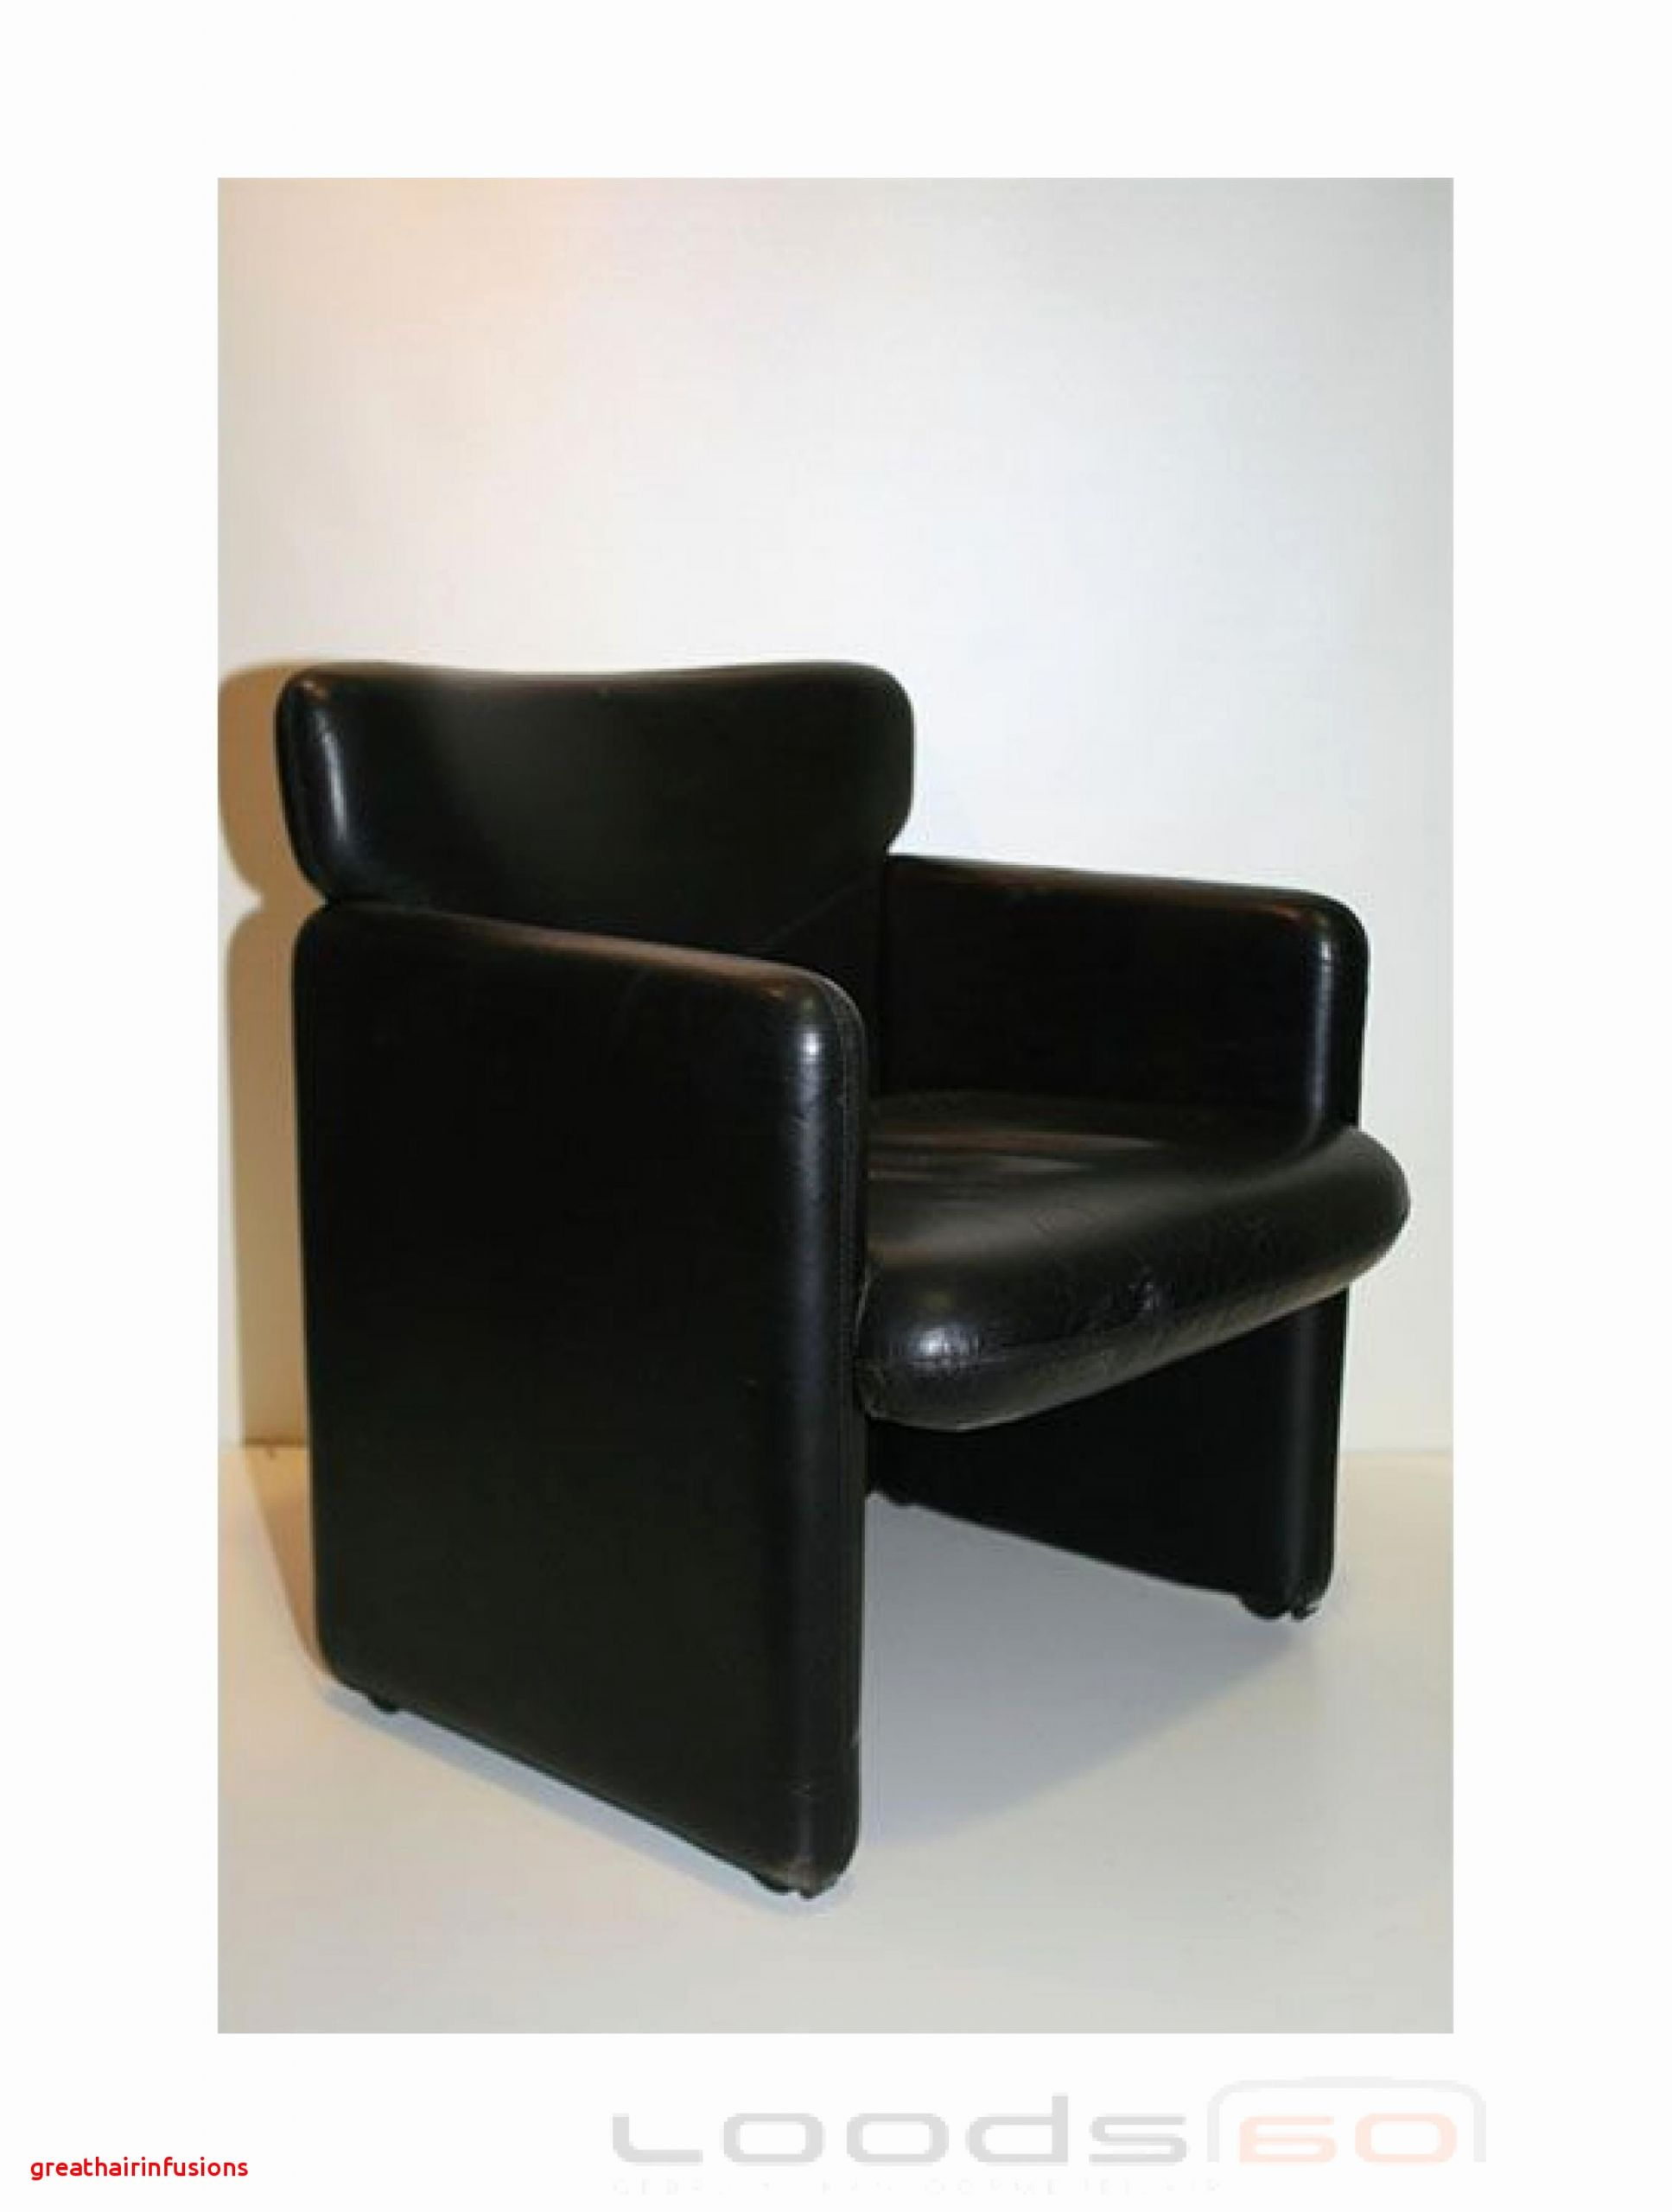 ikea rectangle vase of fauteuil ikea fauteuil relax ikea luxe fauteuil salon ikea fresh regarding fauteuil ikea fauteuil relax ikea luxe fauteuil salon ikea fresh ikea fauteil 0d